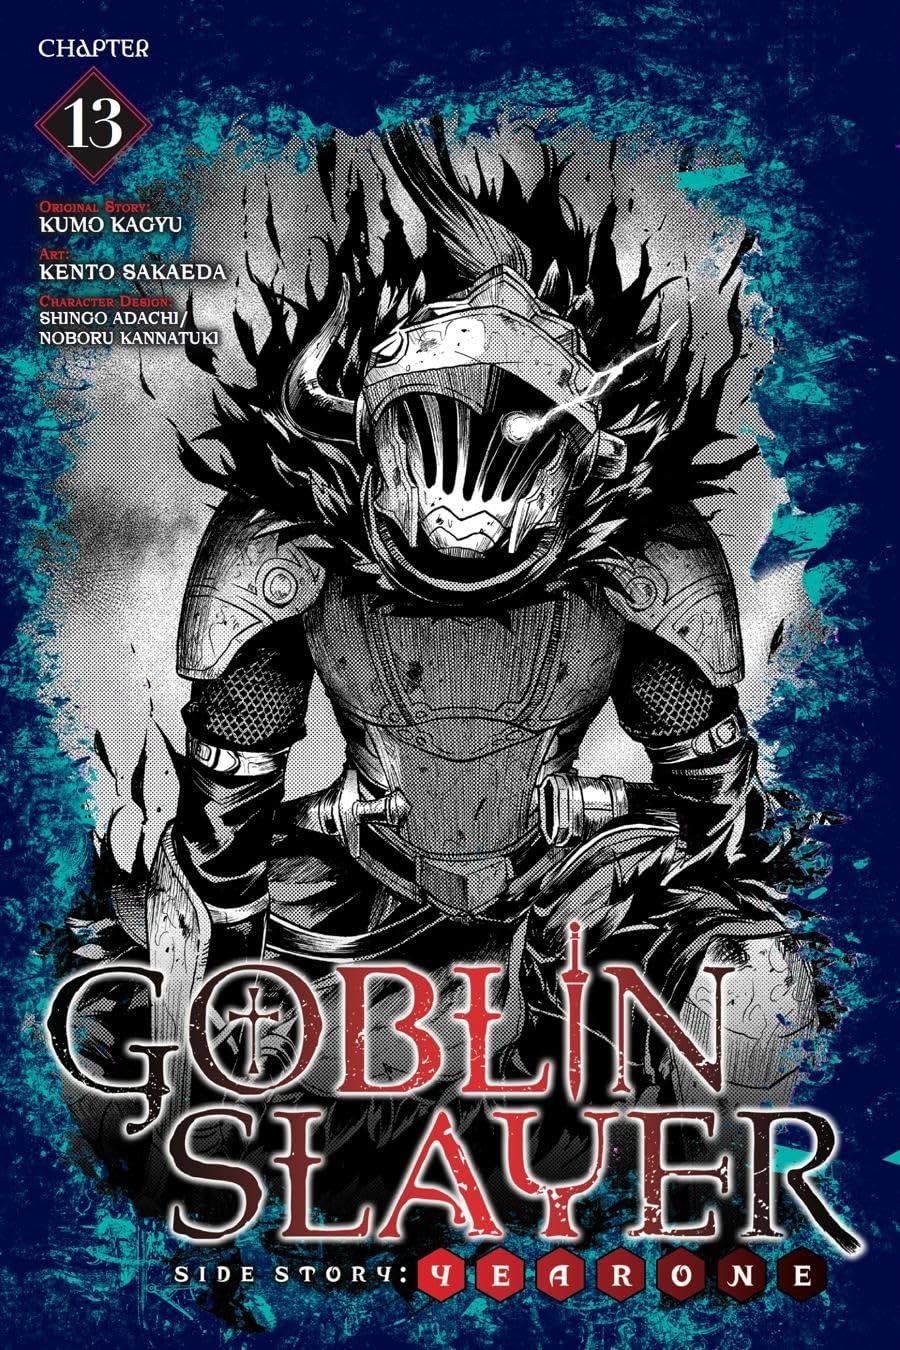 Goblin Slayer Side Story: Year One #13